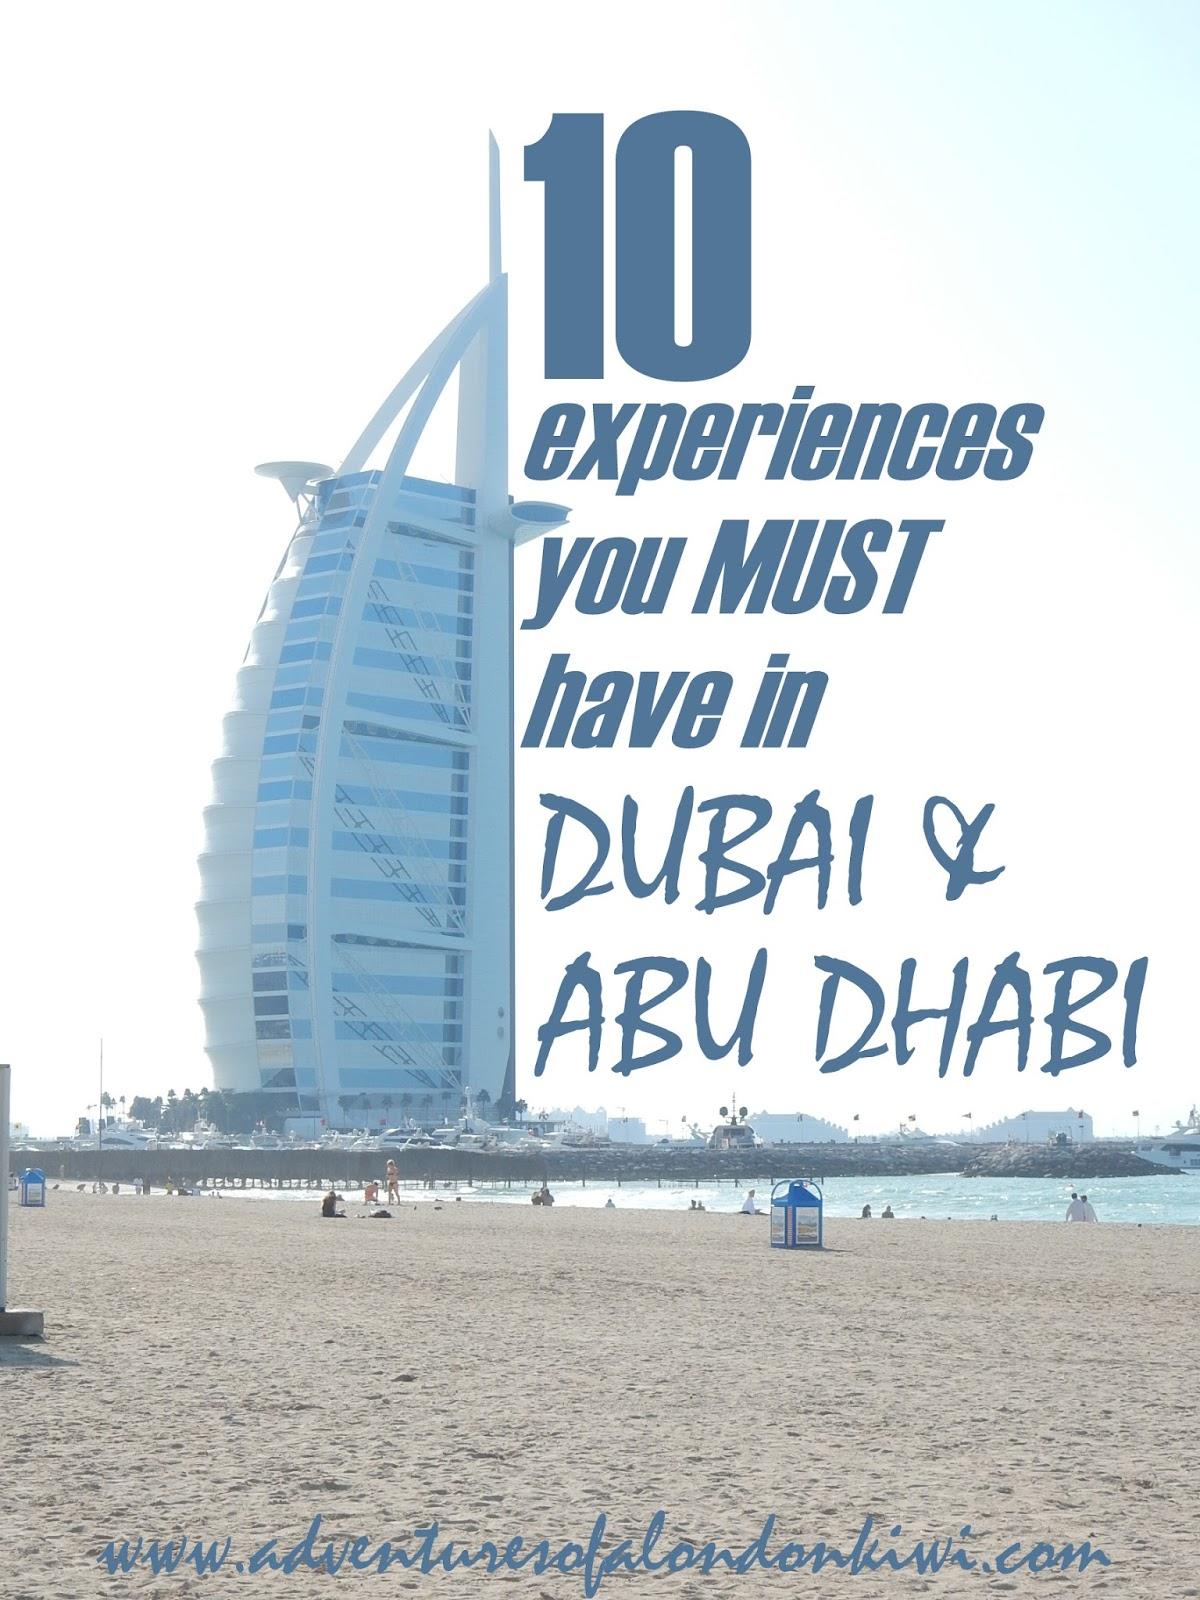 City guide to Dubai and Abu Dhabi